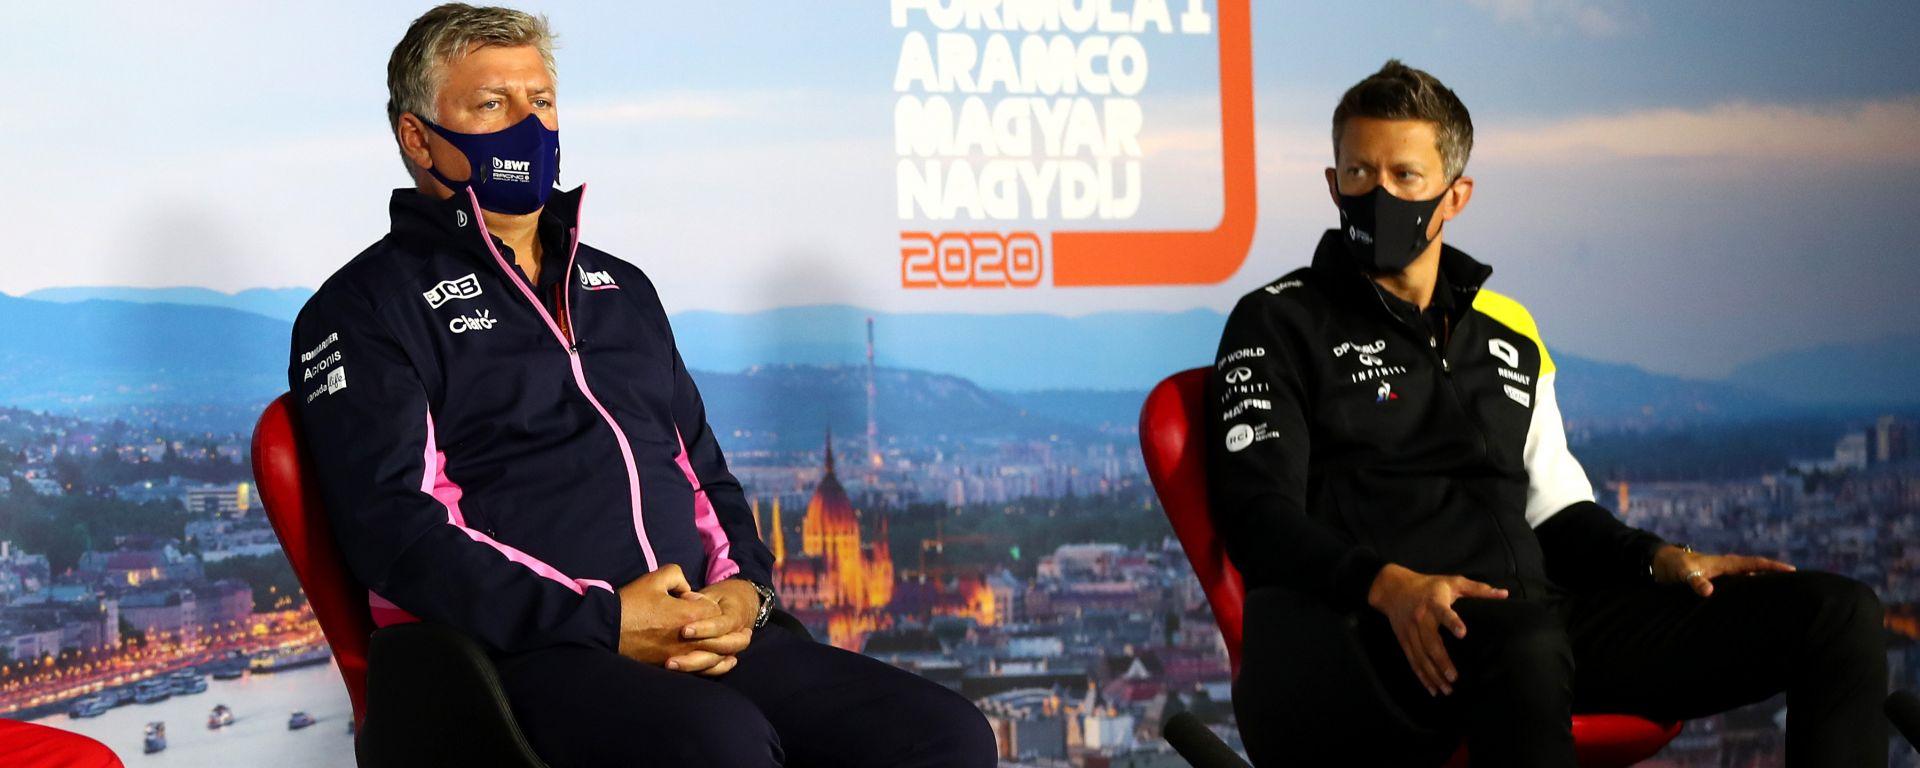 F1, GP Ungheria 2020: Mattia Binotto (Ferrari), Otmar Szafnauer (Racing Point) e Marcin Budkowski (Renault) in conferenza stampa